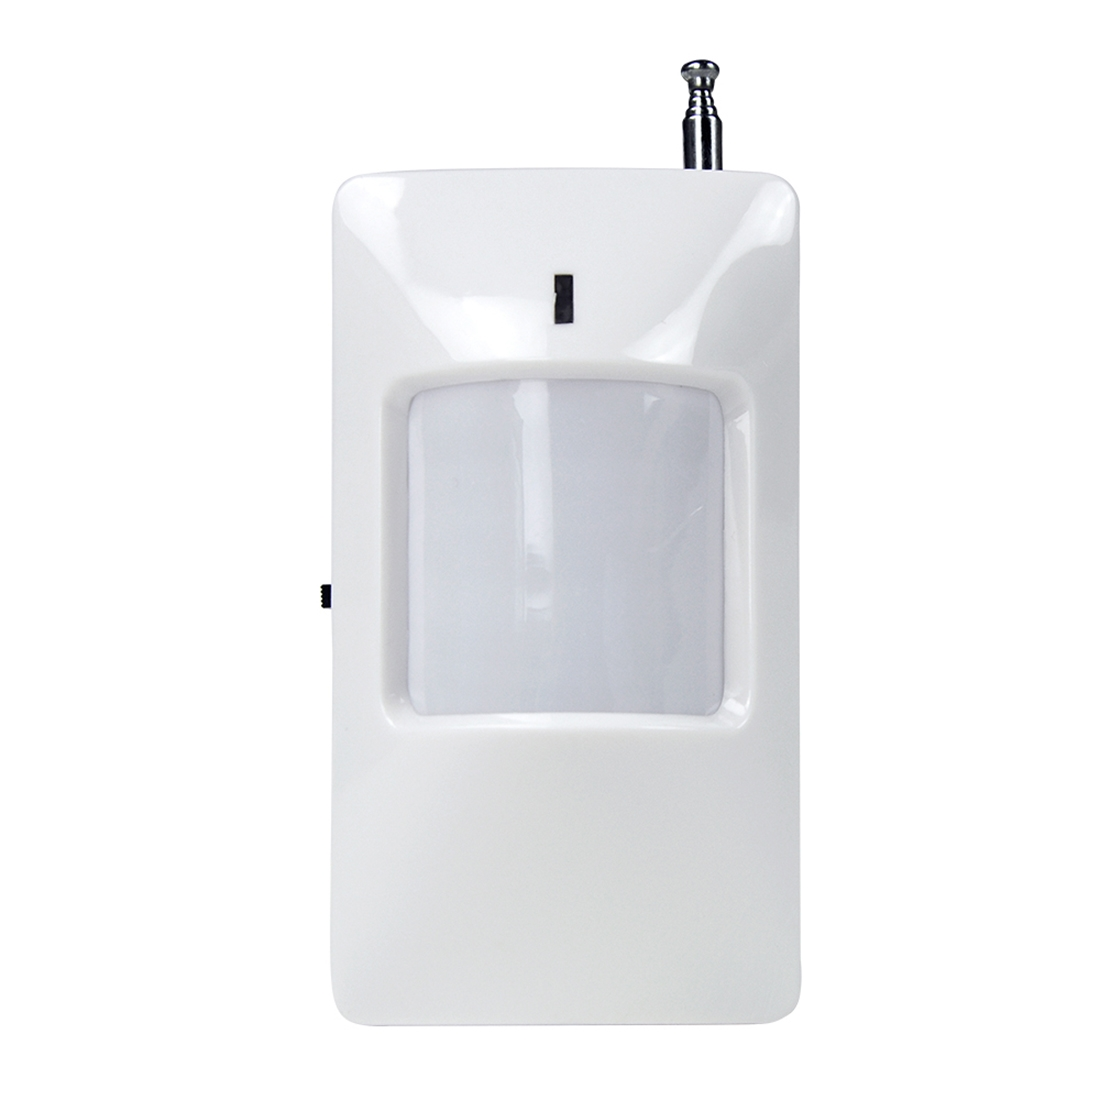 alarm sirene dauerstrom alarmanlage bewegungsmelder sofort alarm bewegung a176 ebay. Black Bedroom Furniture Sets. Home Design Ideas